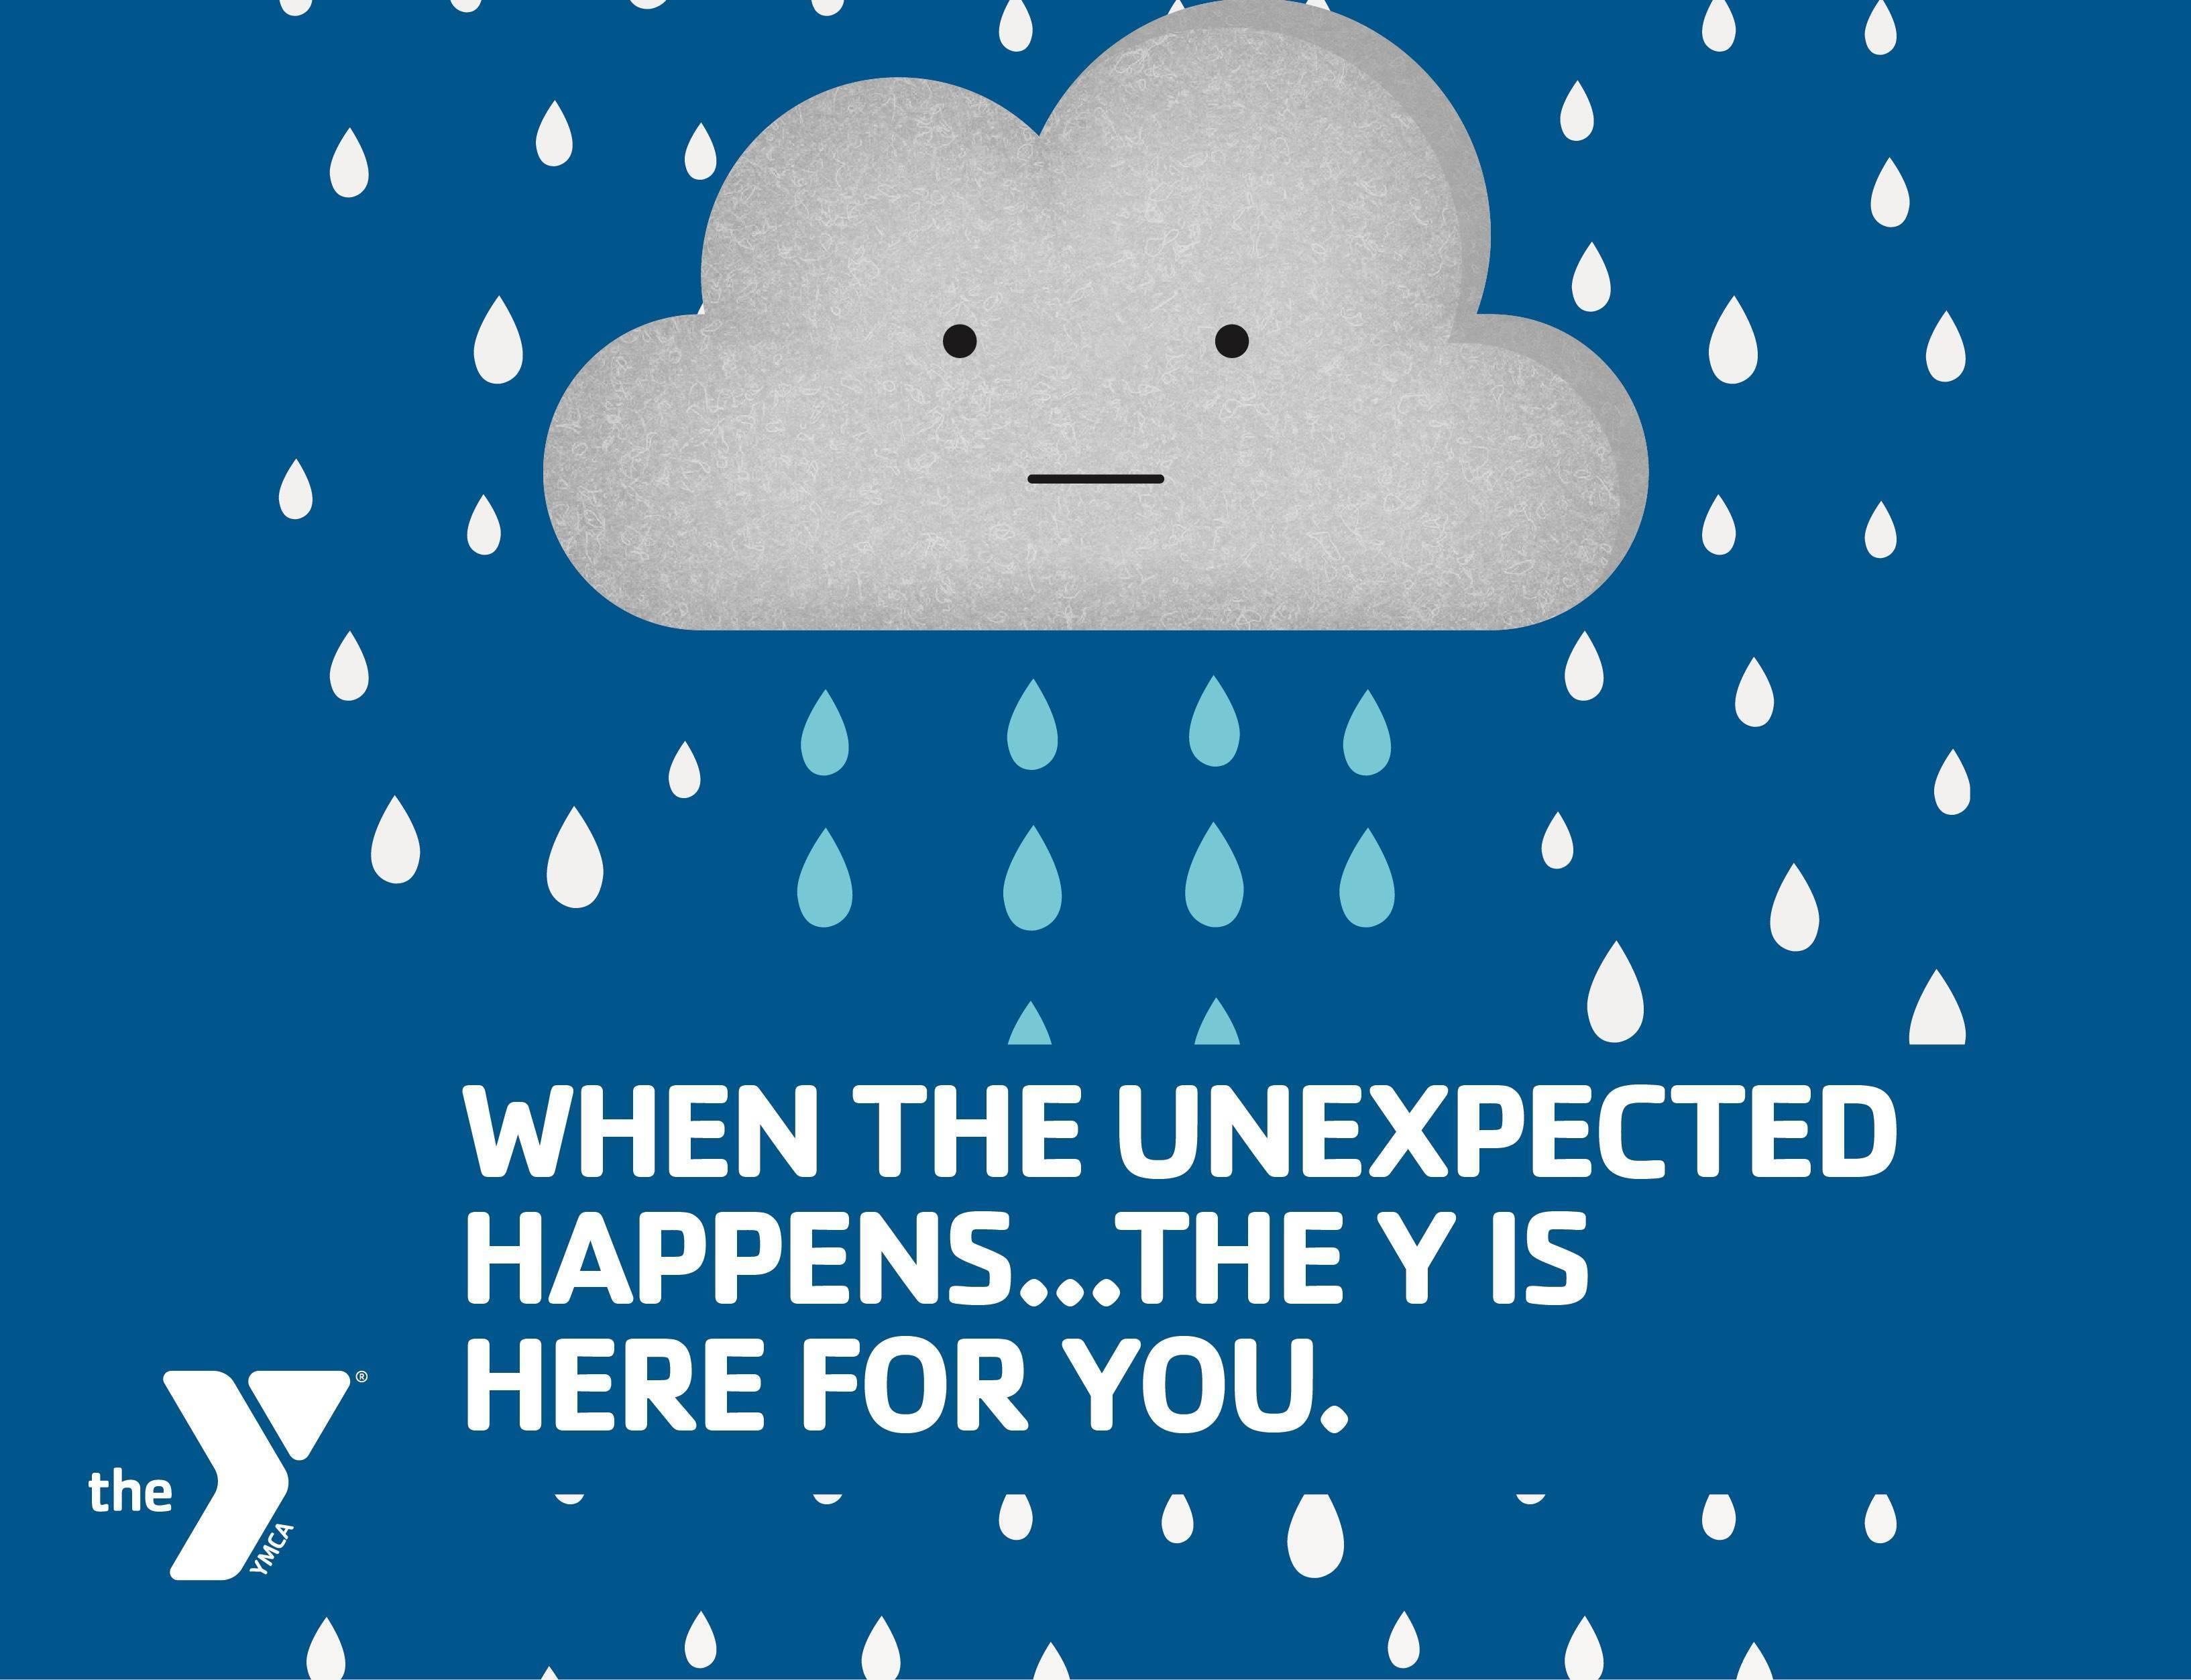 WhenUnexpectedHappens-ThisVersion.jpg